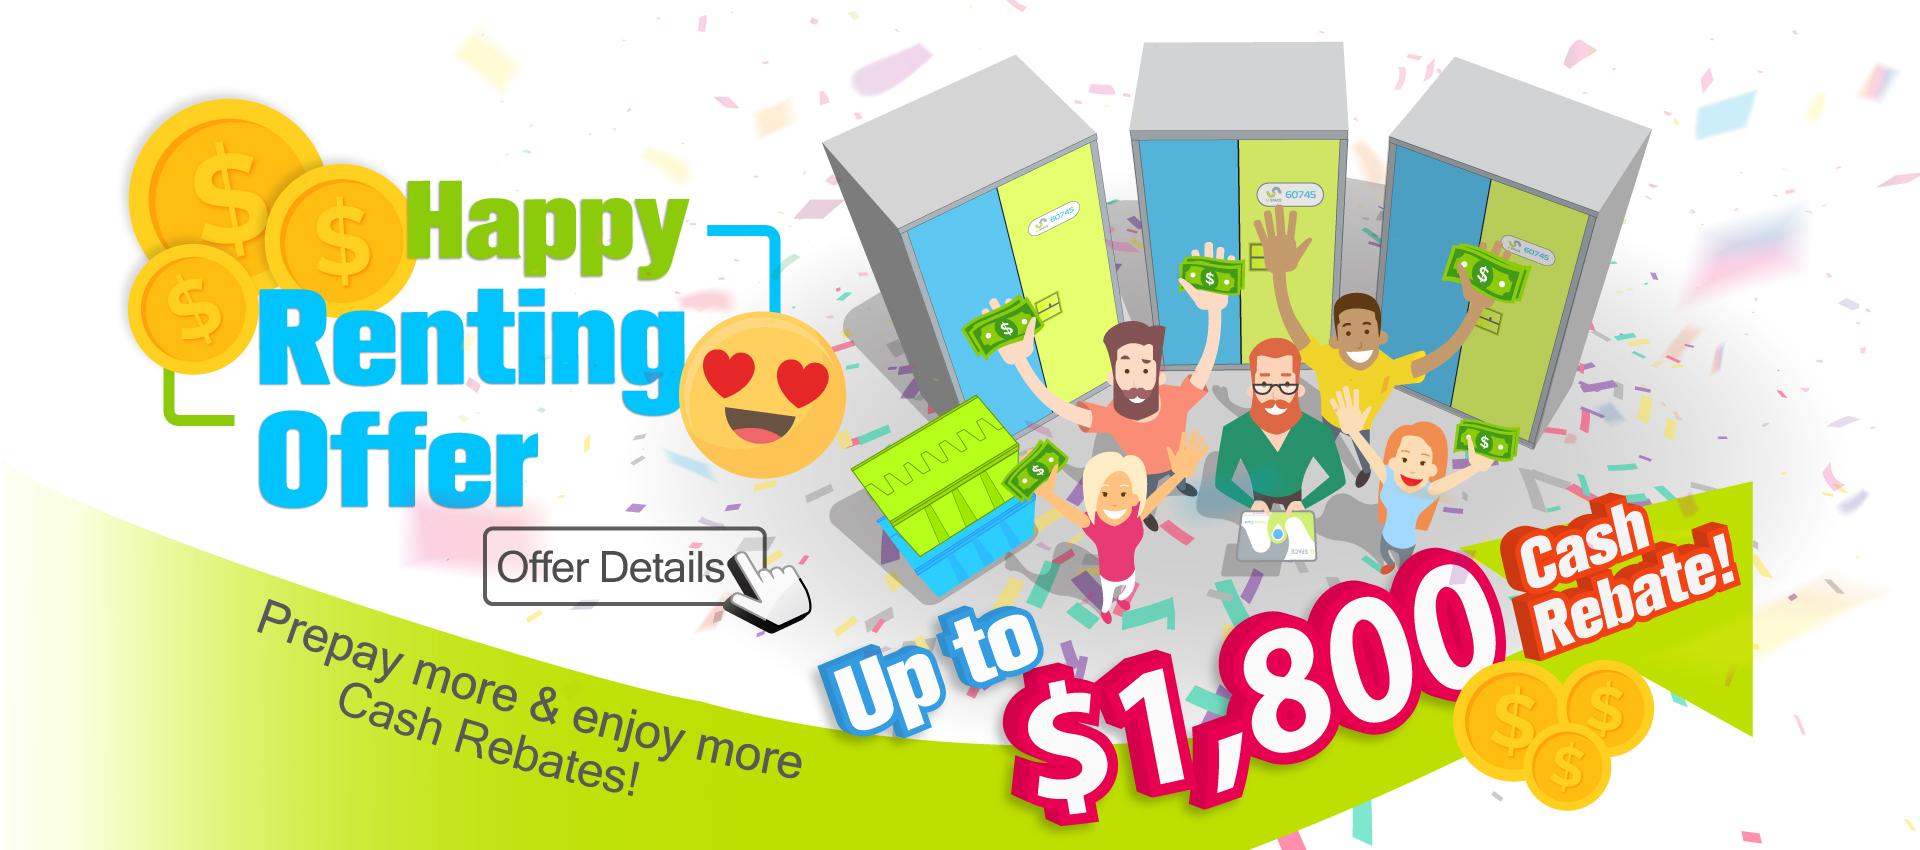 Happy Renting Offer : Up to $1,800 Cash Rebate! Prepay more & enjoy more Cash Rebates!